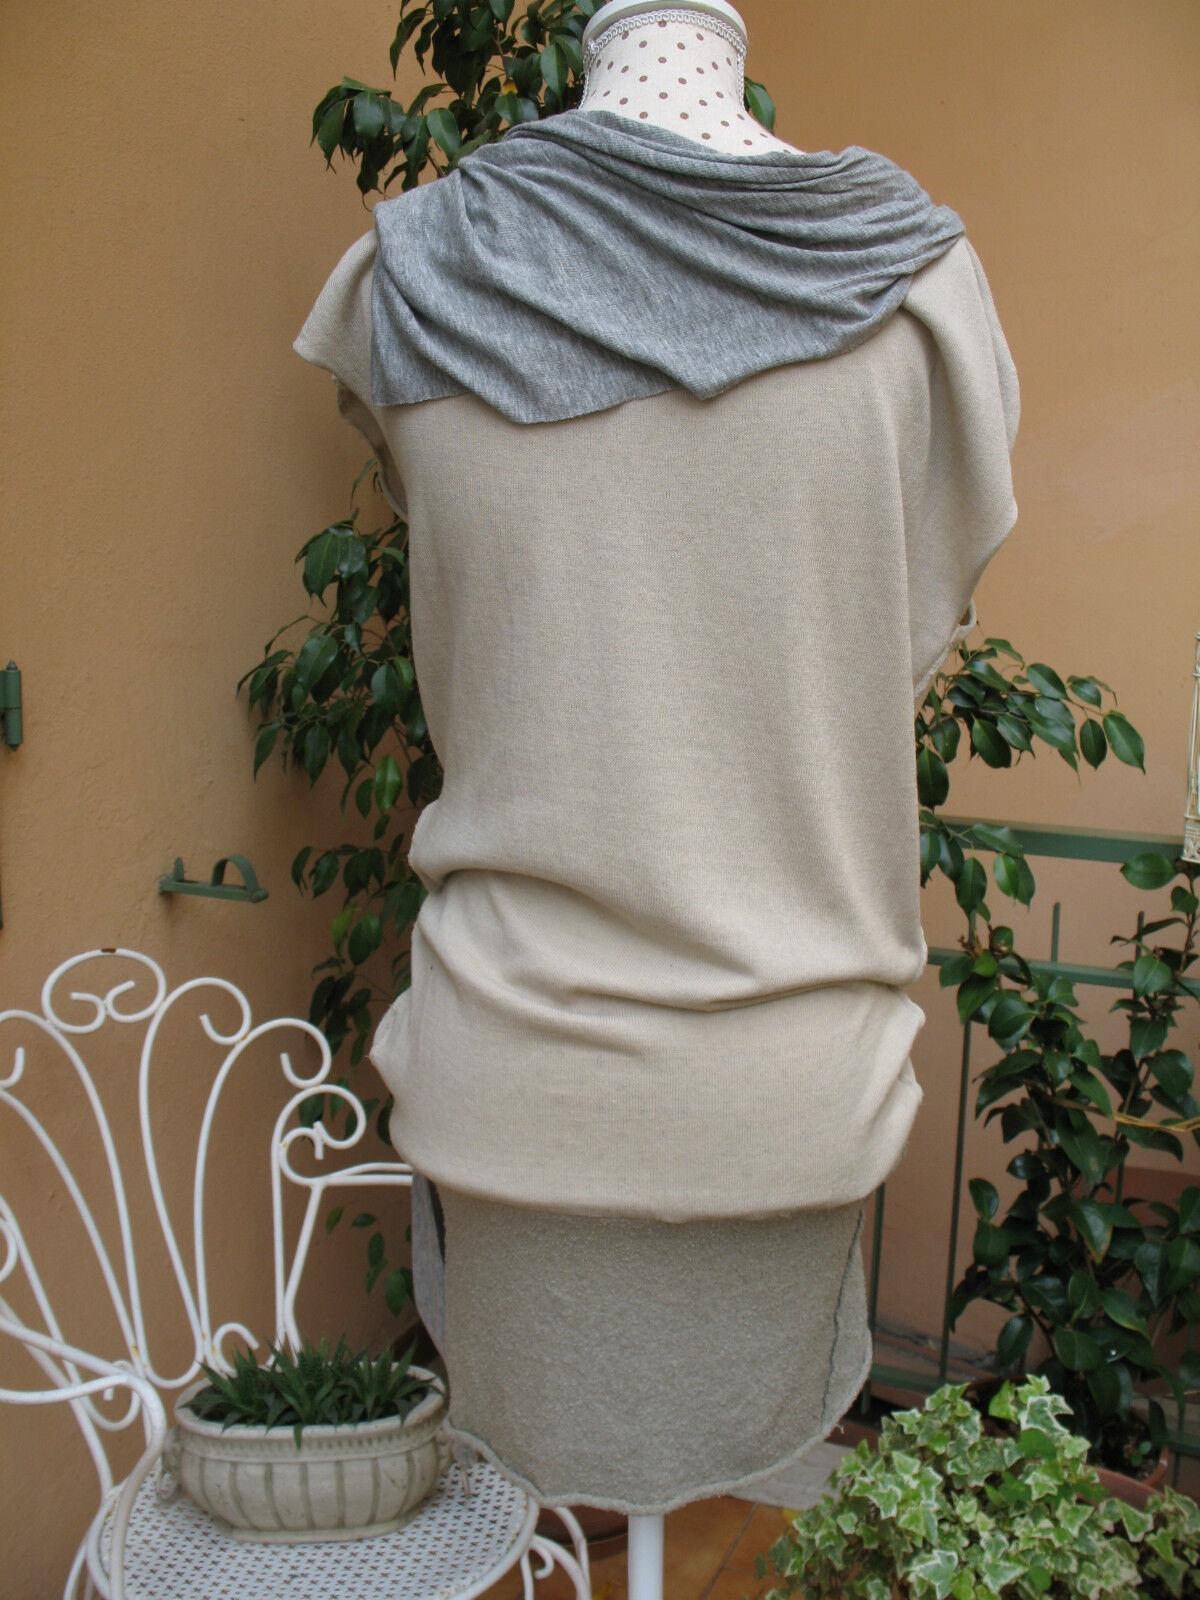 Dub qnp maxi maglia vestito stile stile stile dondup tg. 42 - 44 0df1a6